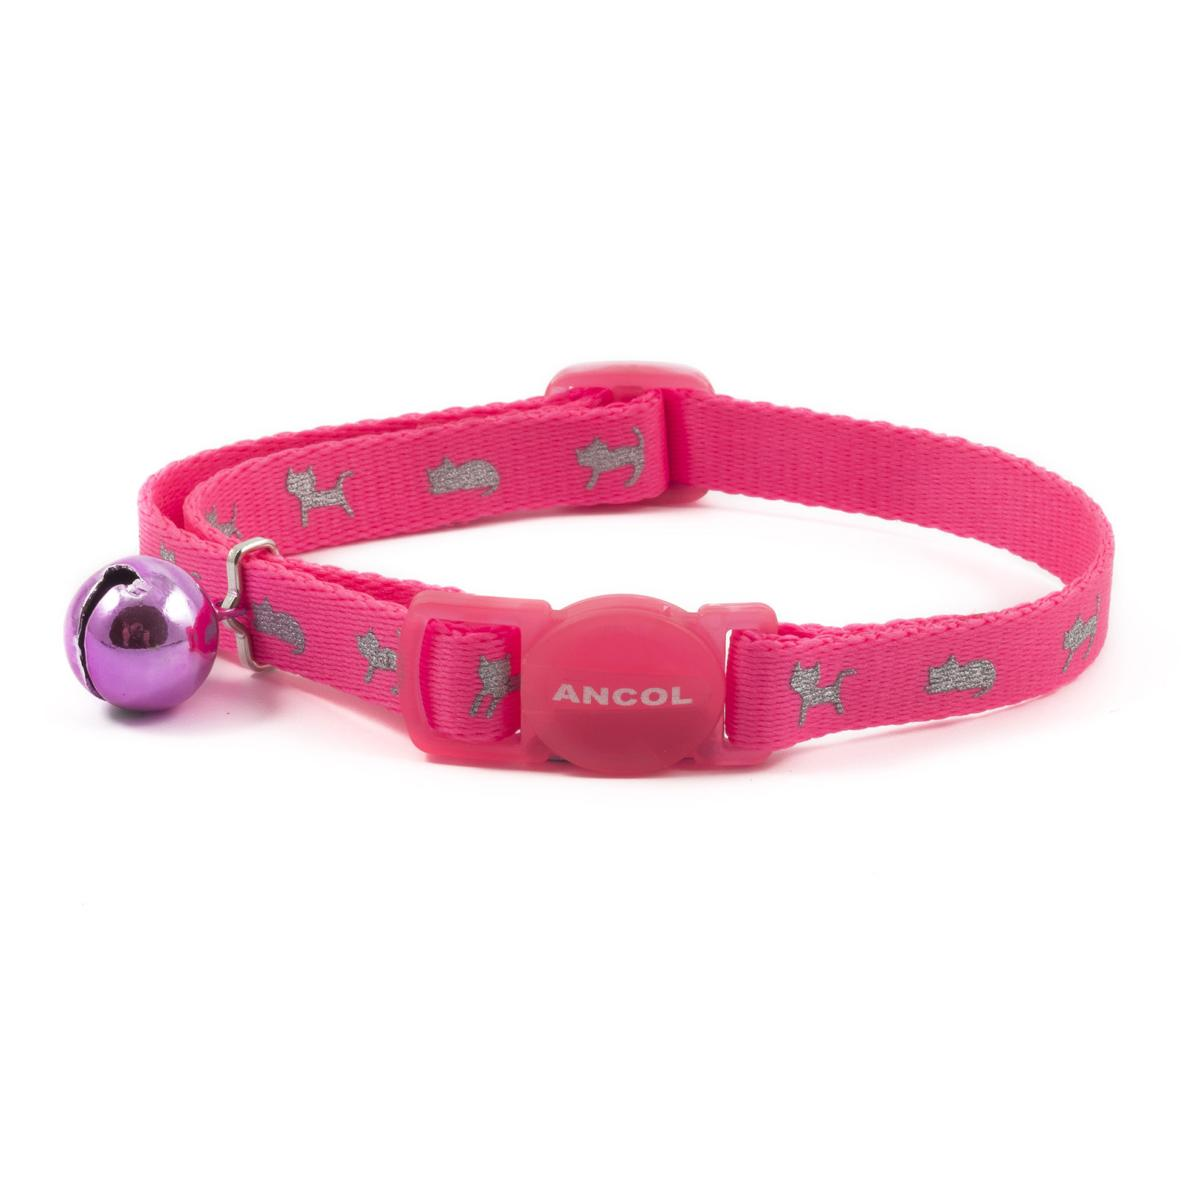 CLEARANCE Ancol Neon Reflective Kitten Collar Pink 15-22cm